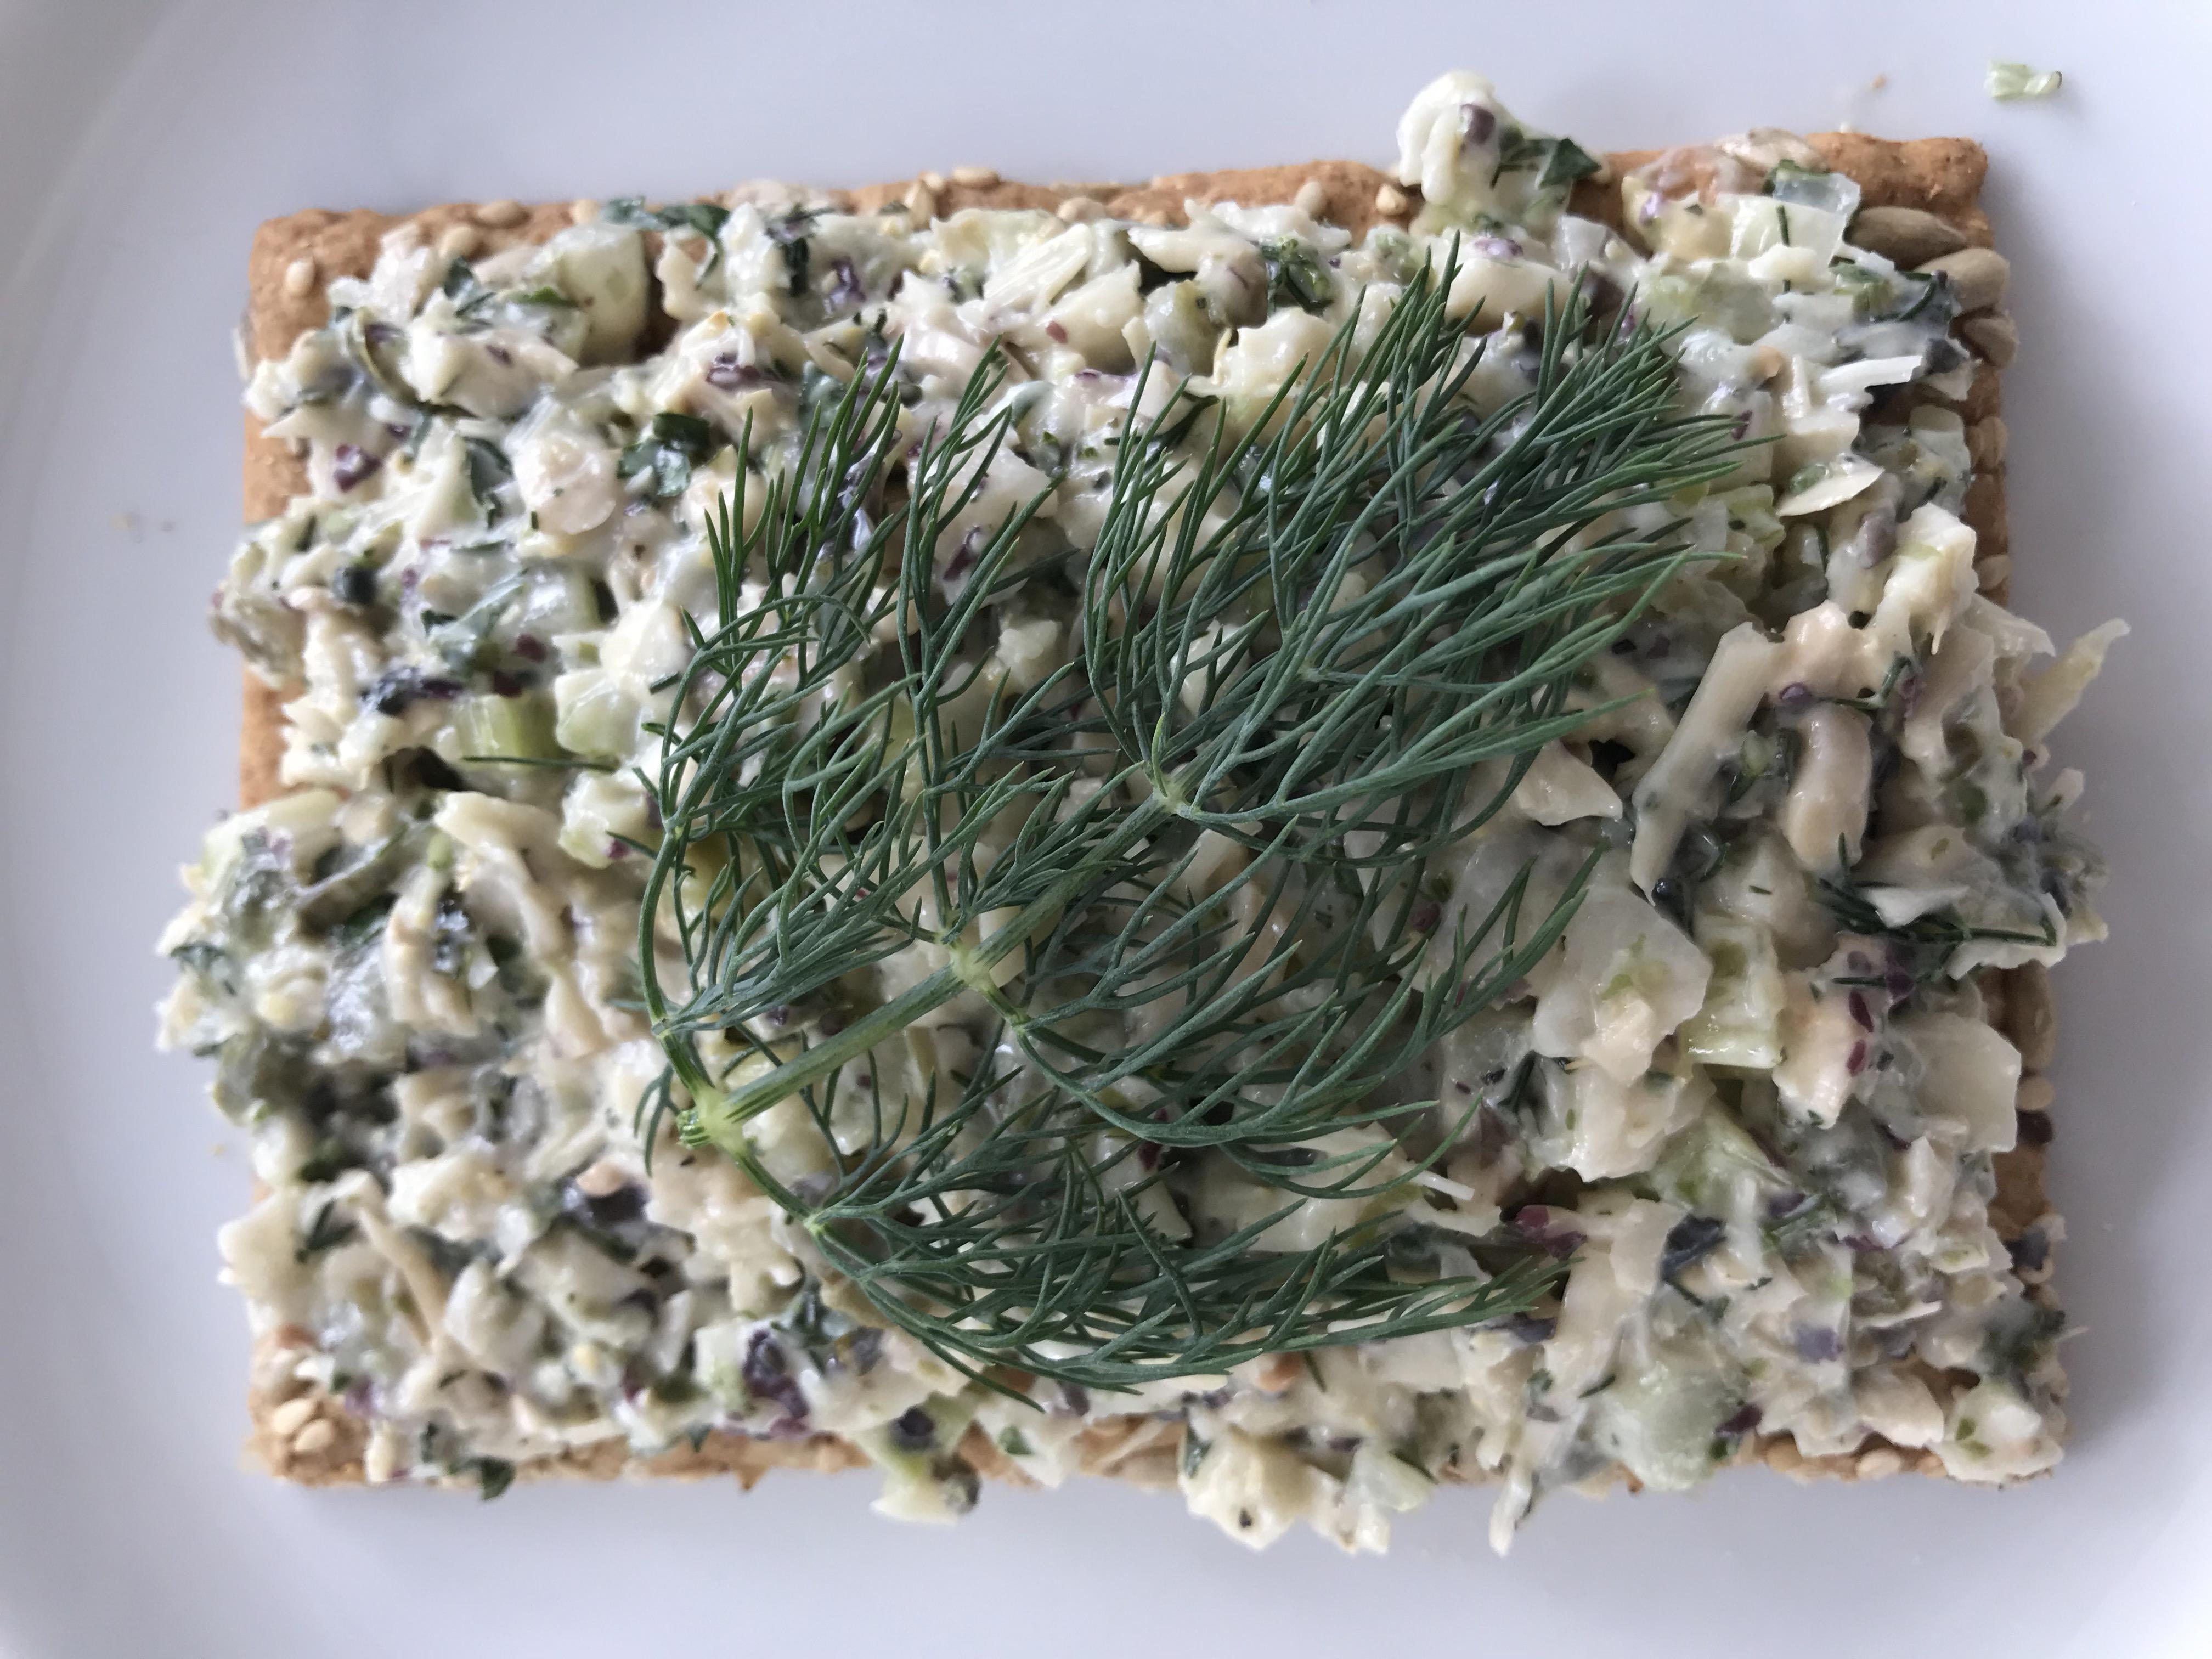 lekker fris op toast of brood met een plukje dille